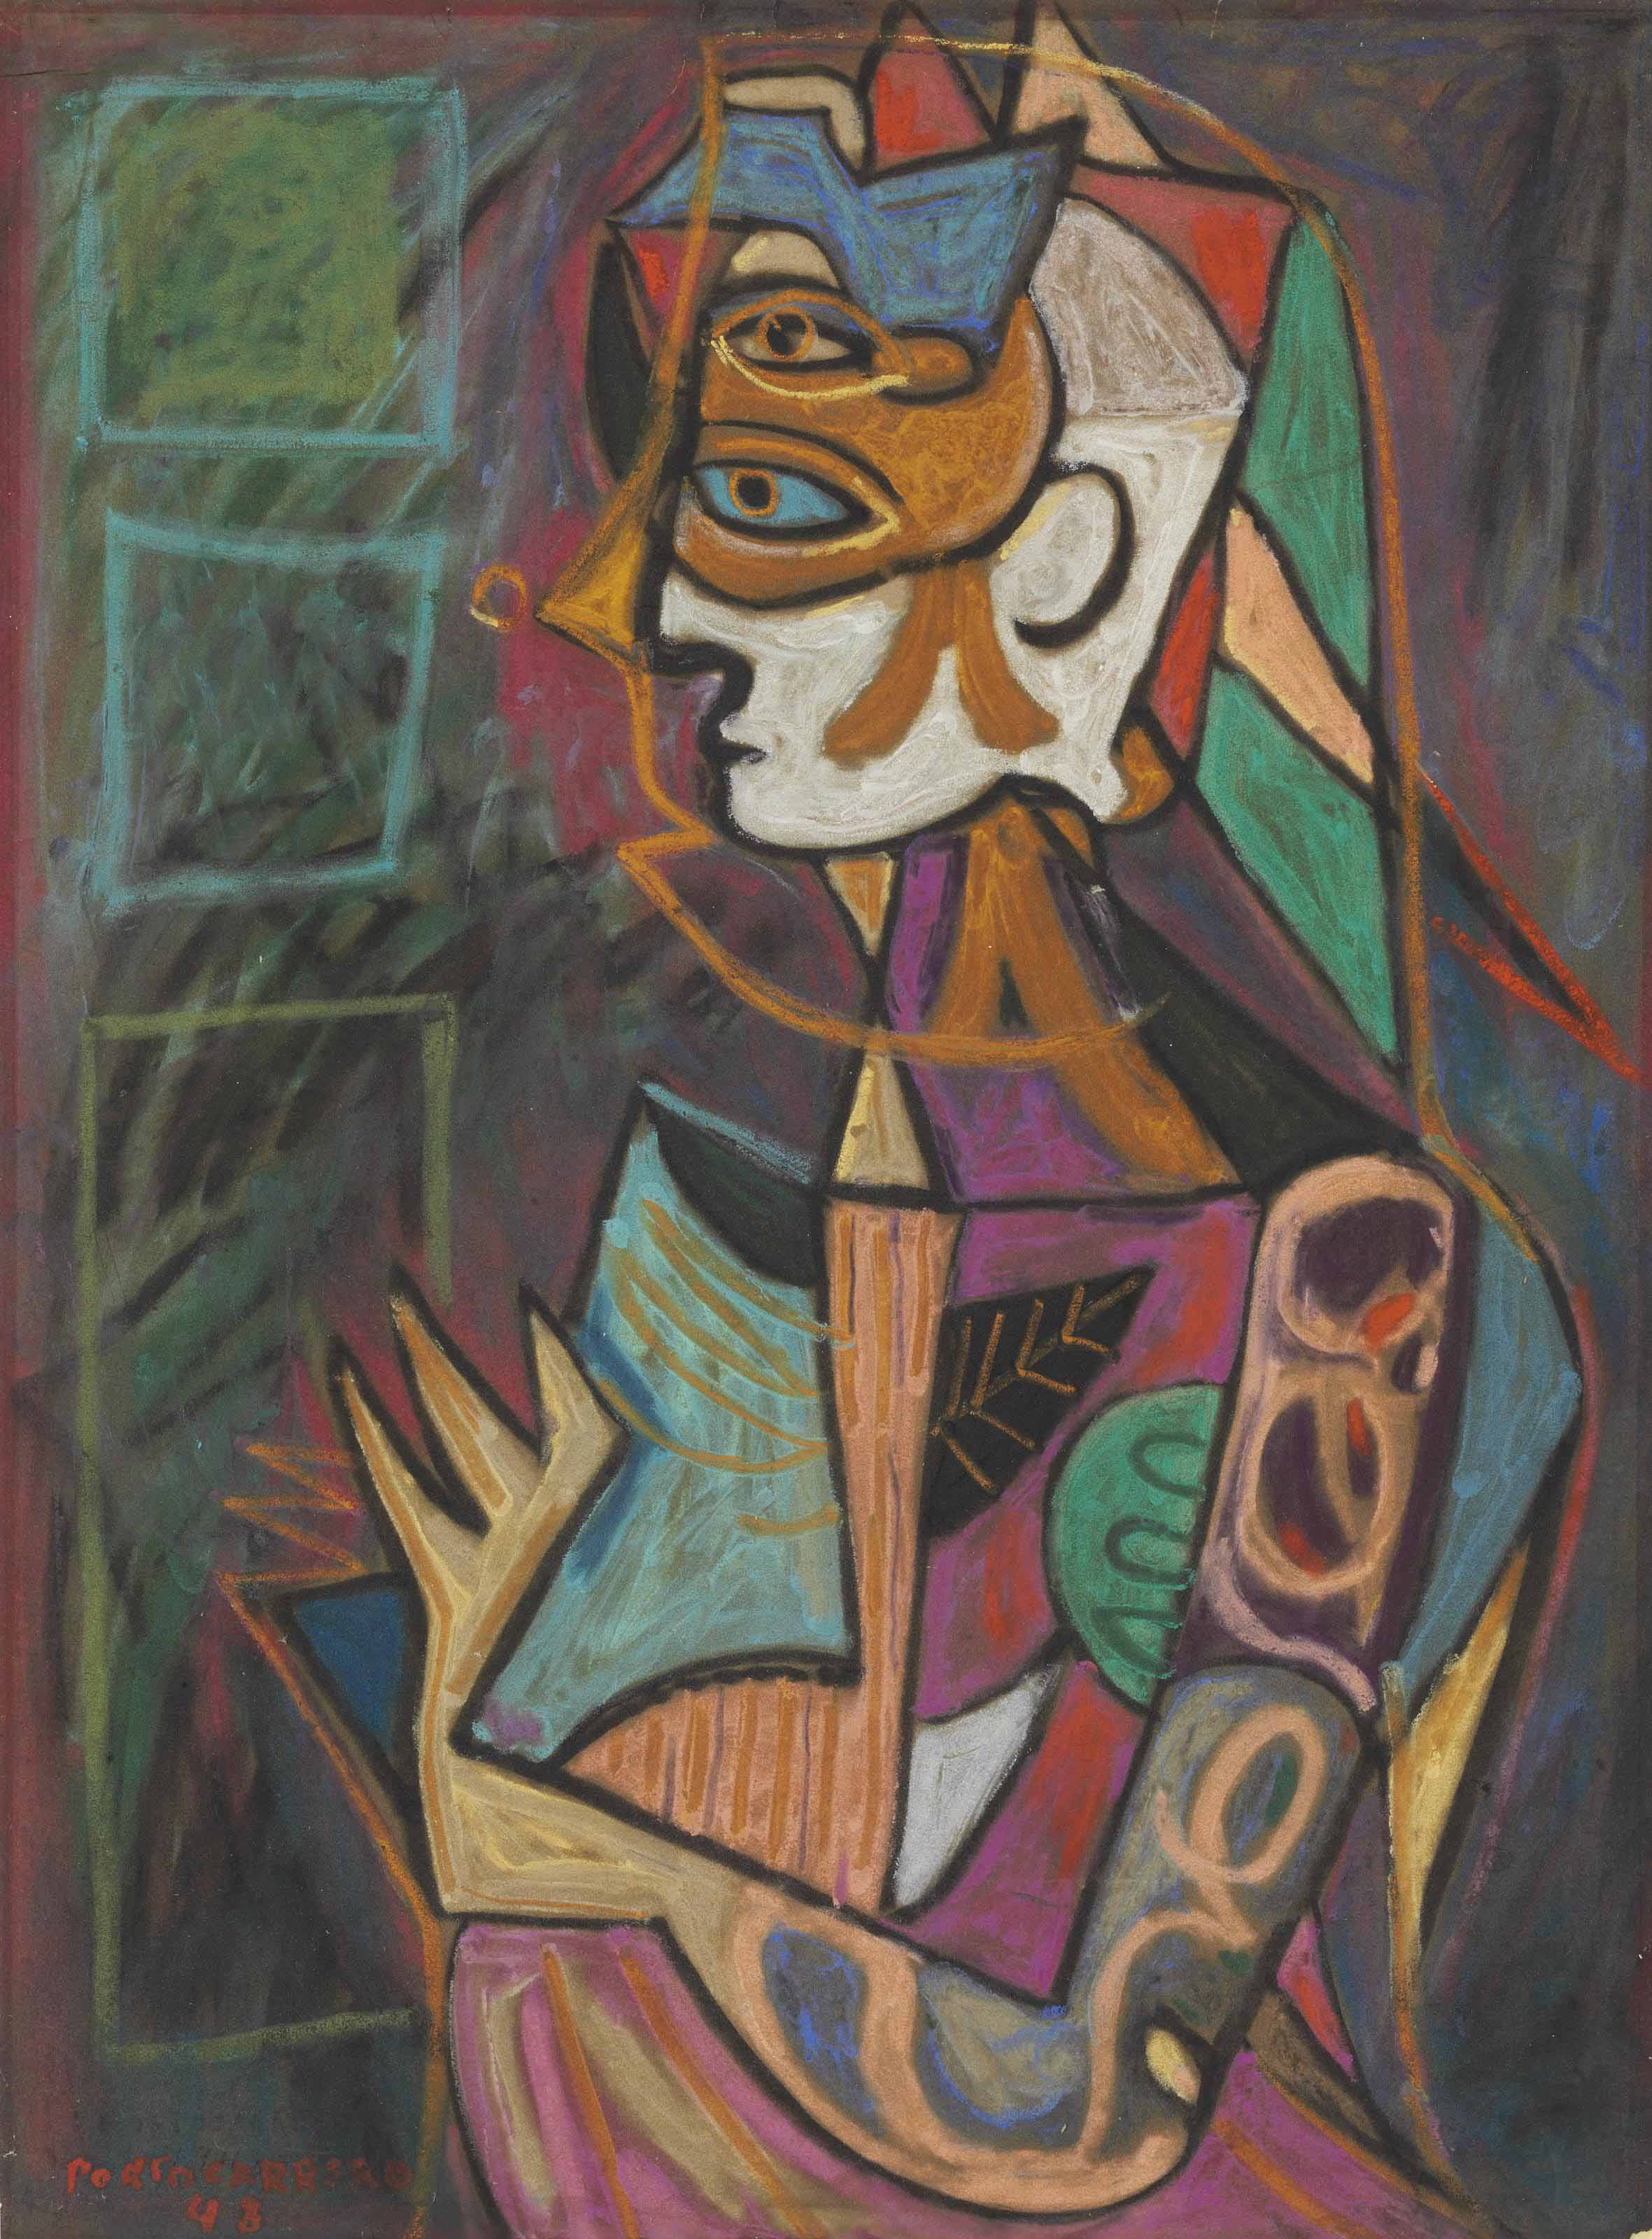 René Portocarrero (1912-1985)